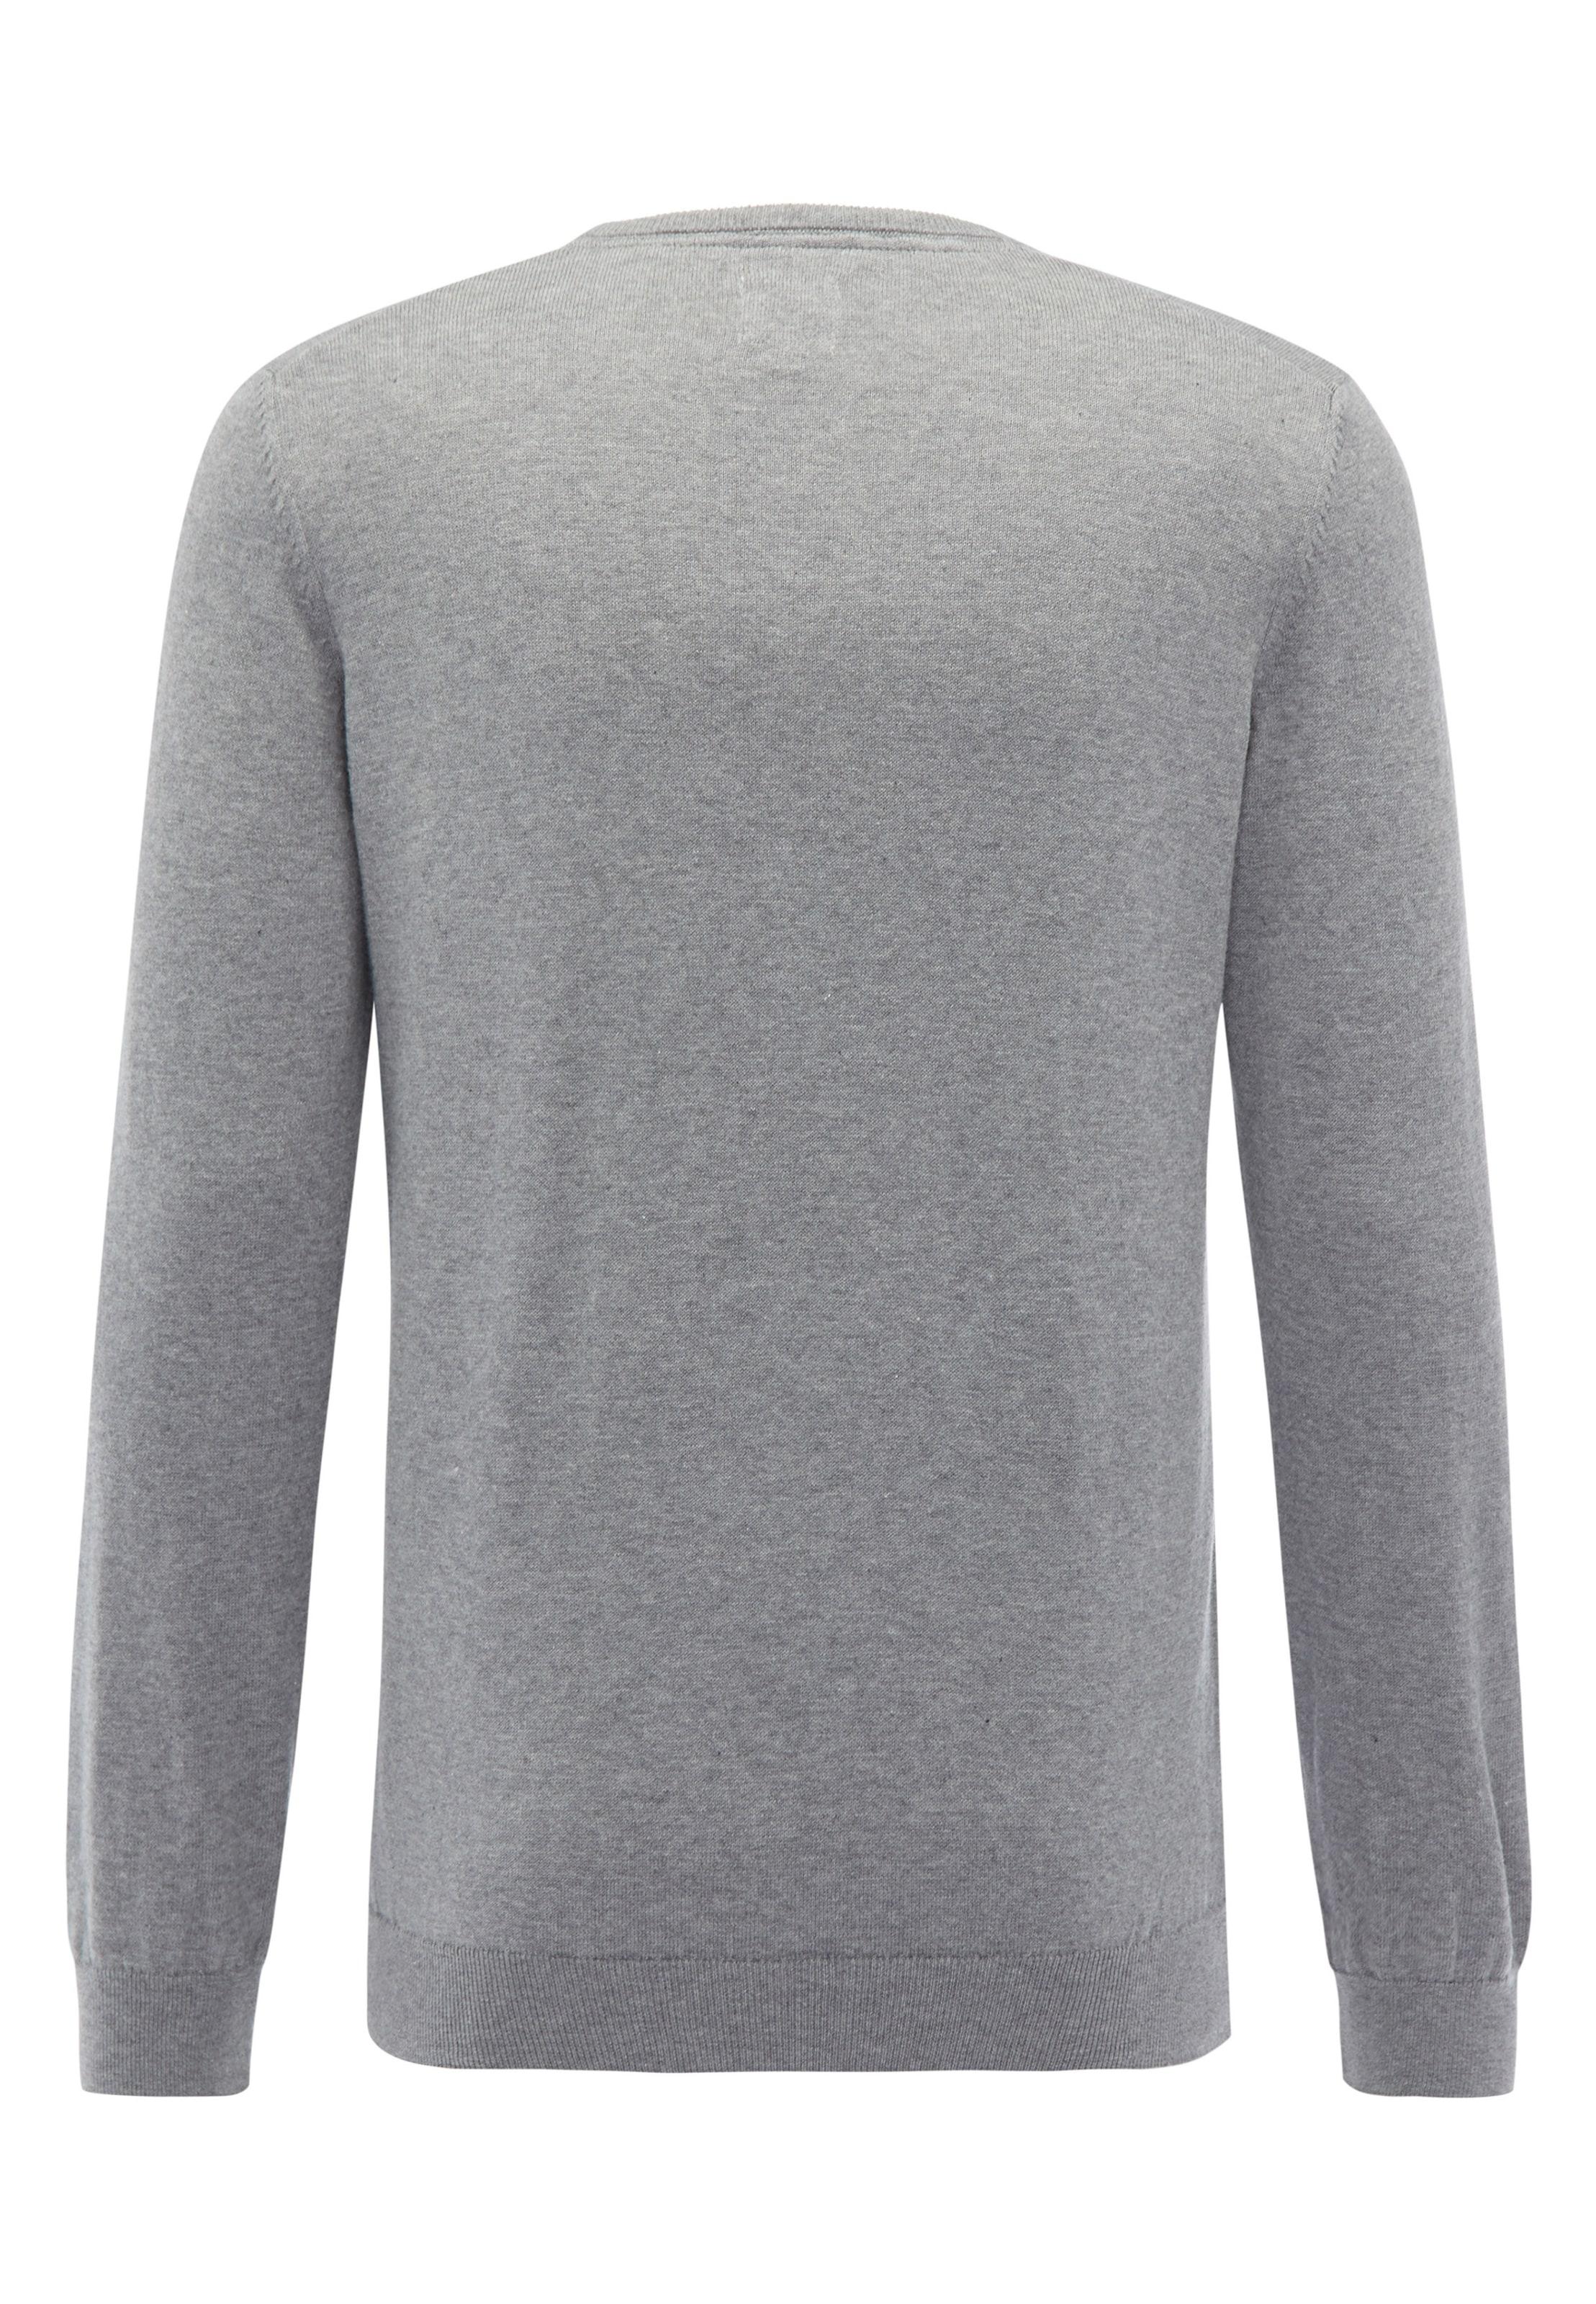 Sweater Graumeliert Mustang Mustang Sweater Graumeliert Sweater In In Mustang f6Yb7yg